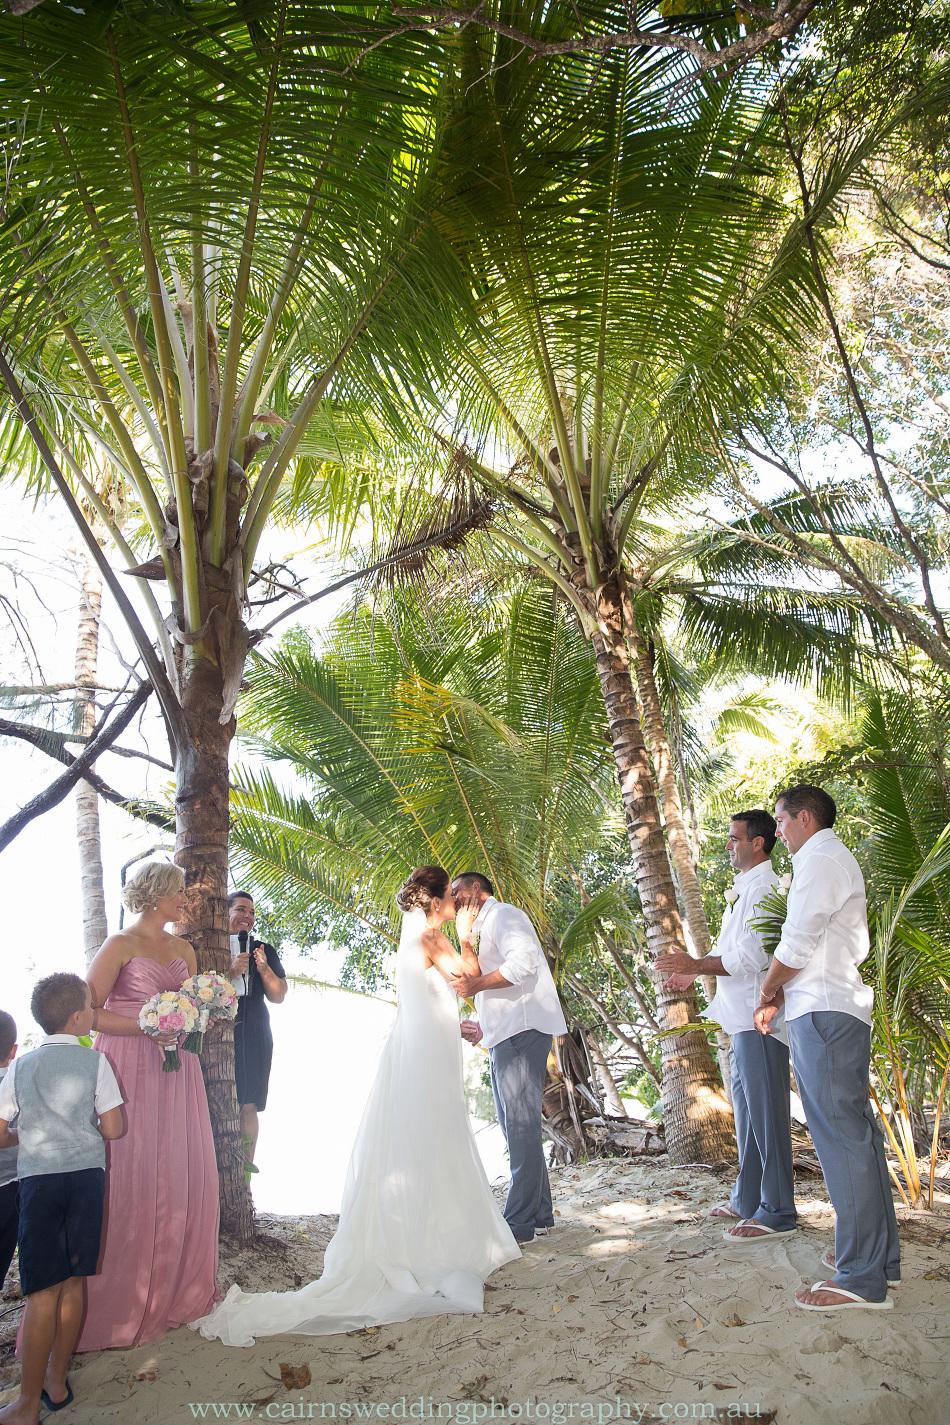 Port Douglas wedding Photography by Nathan David Kelly